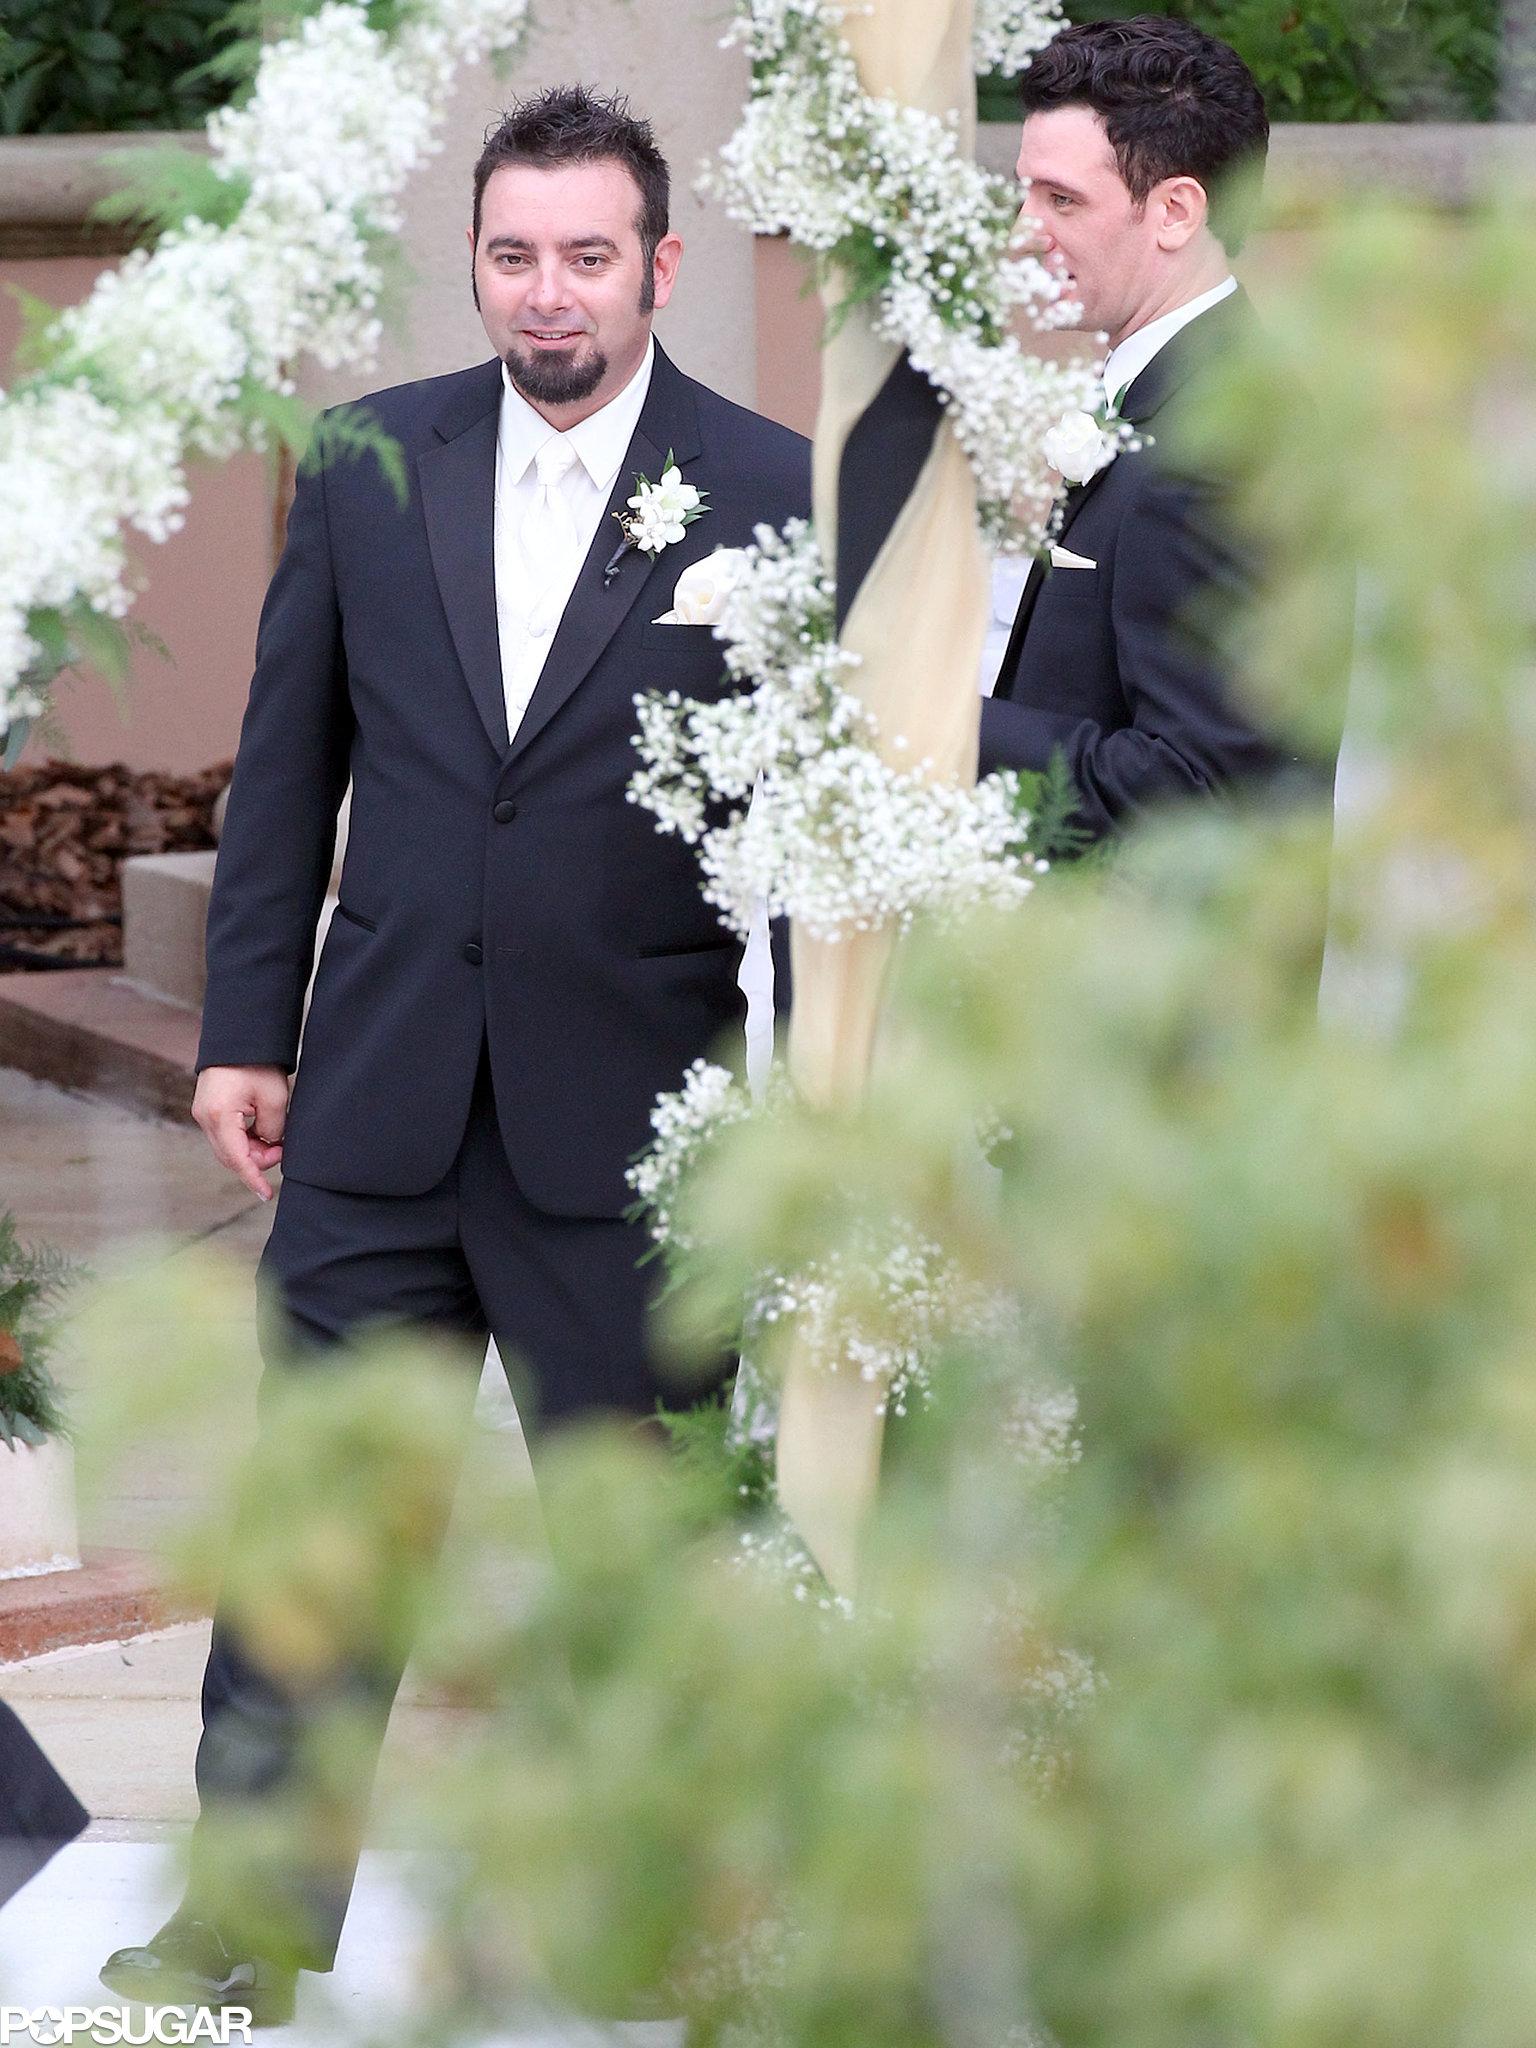 Chris Kirkpatrick got married in Orlando, FL.